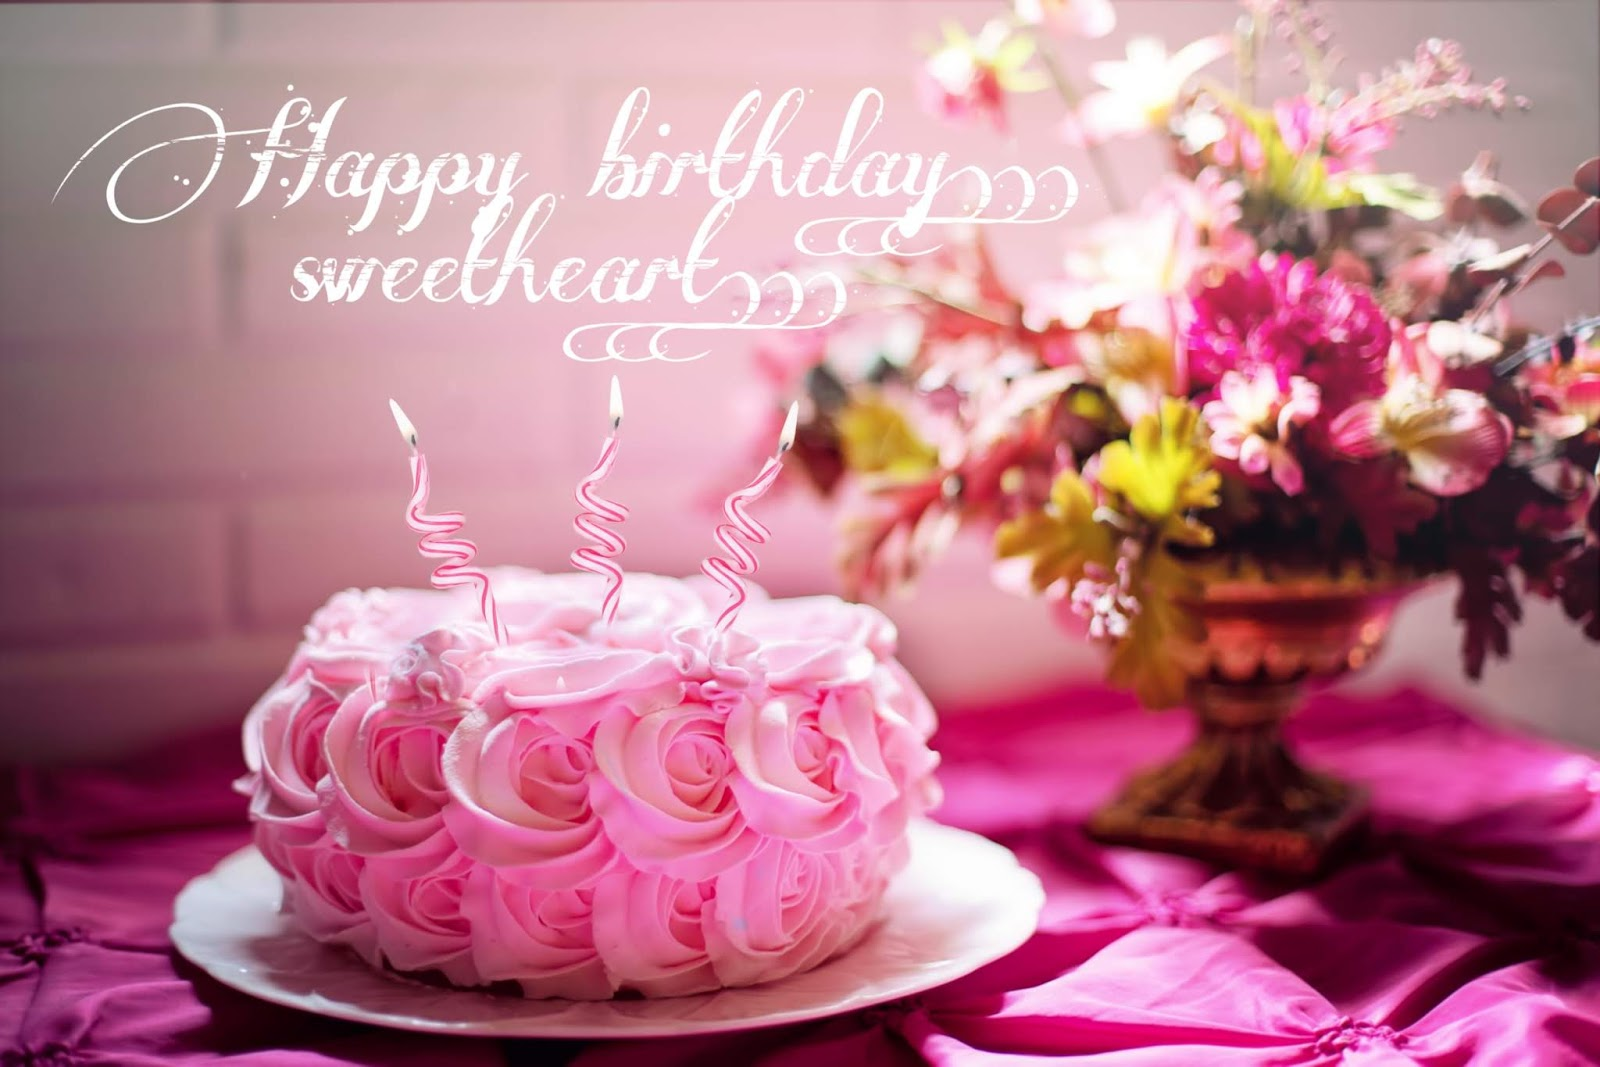 happy birthday wishes e